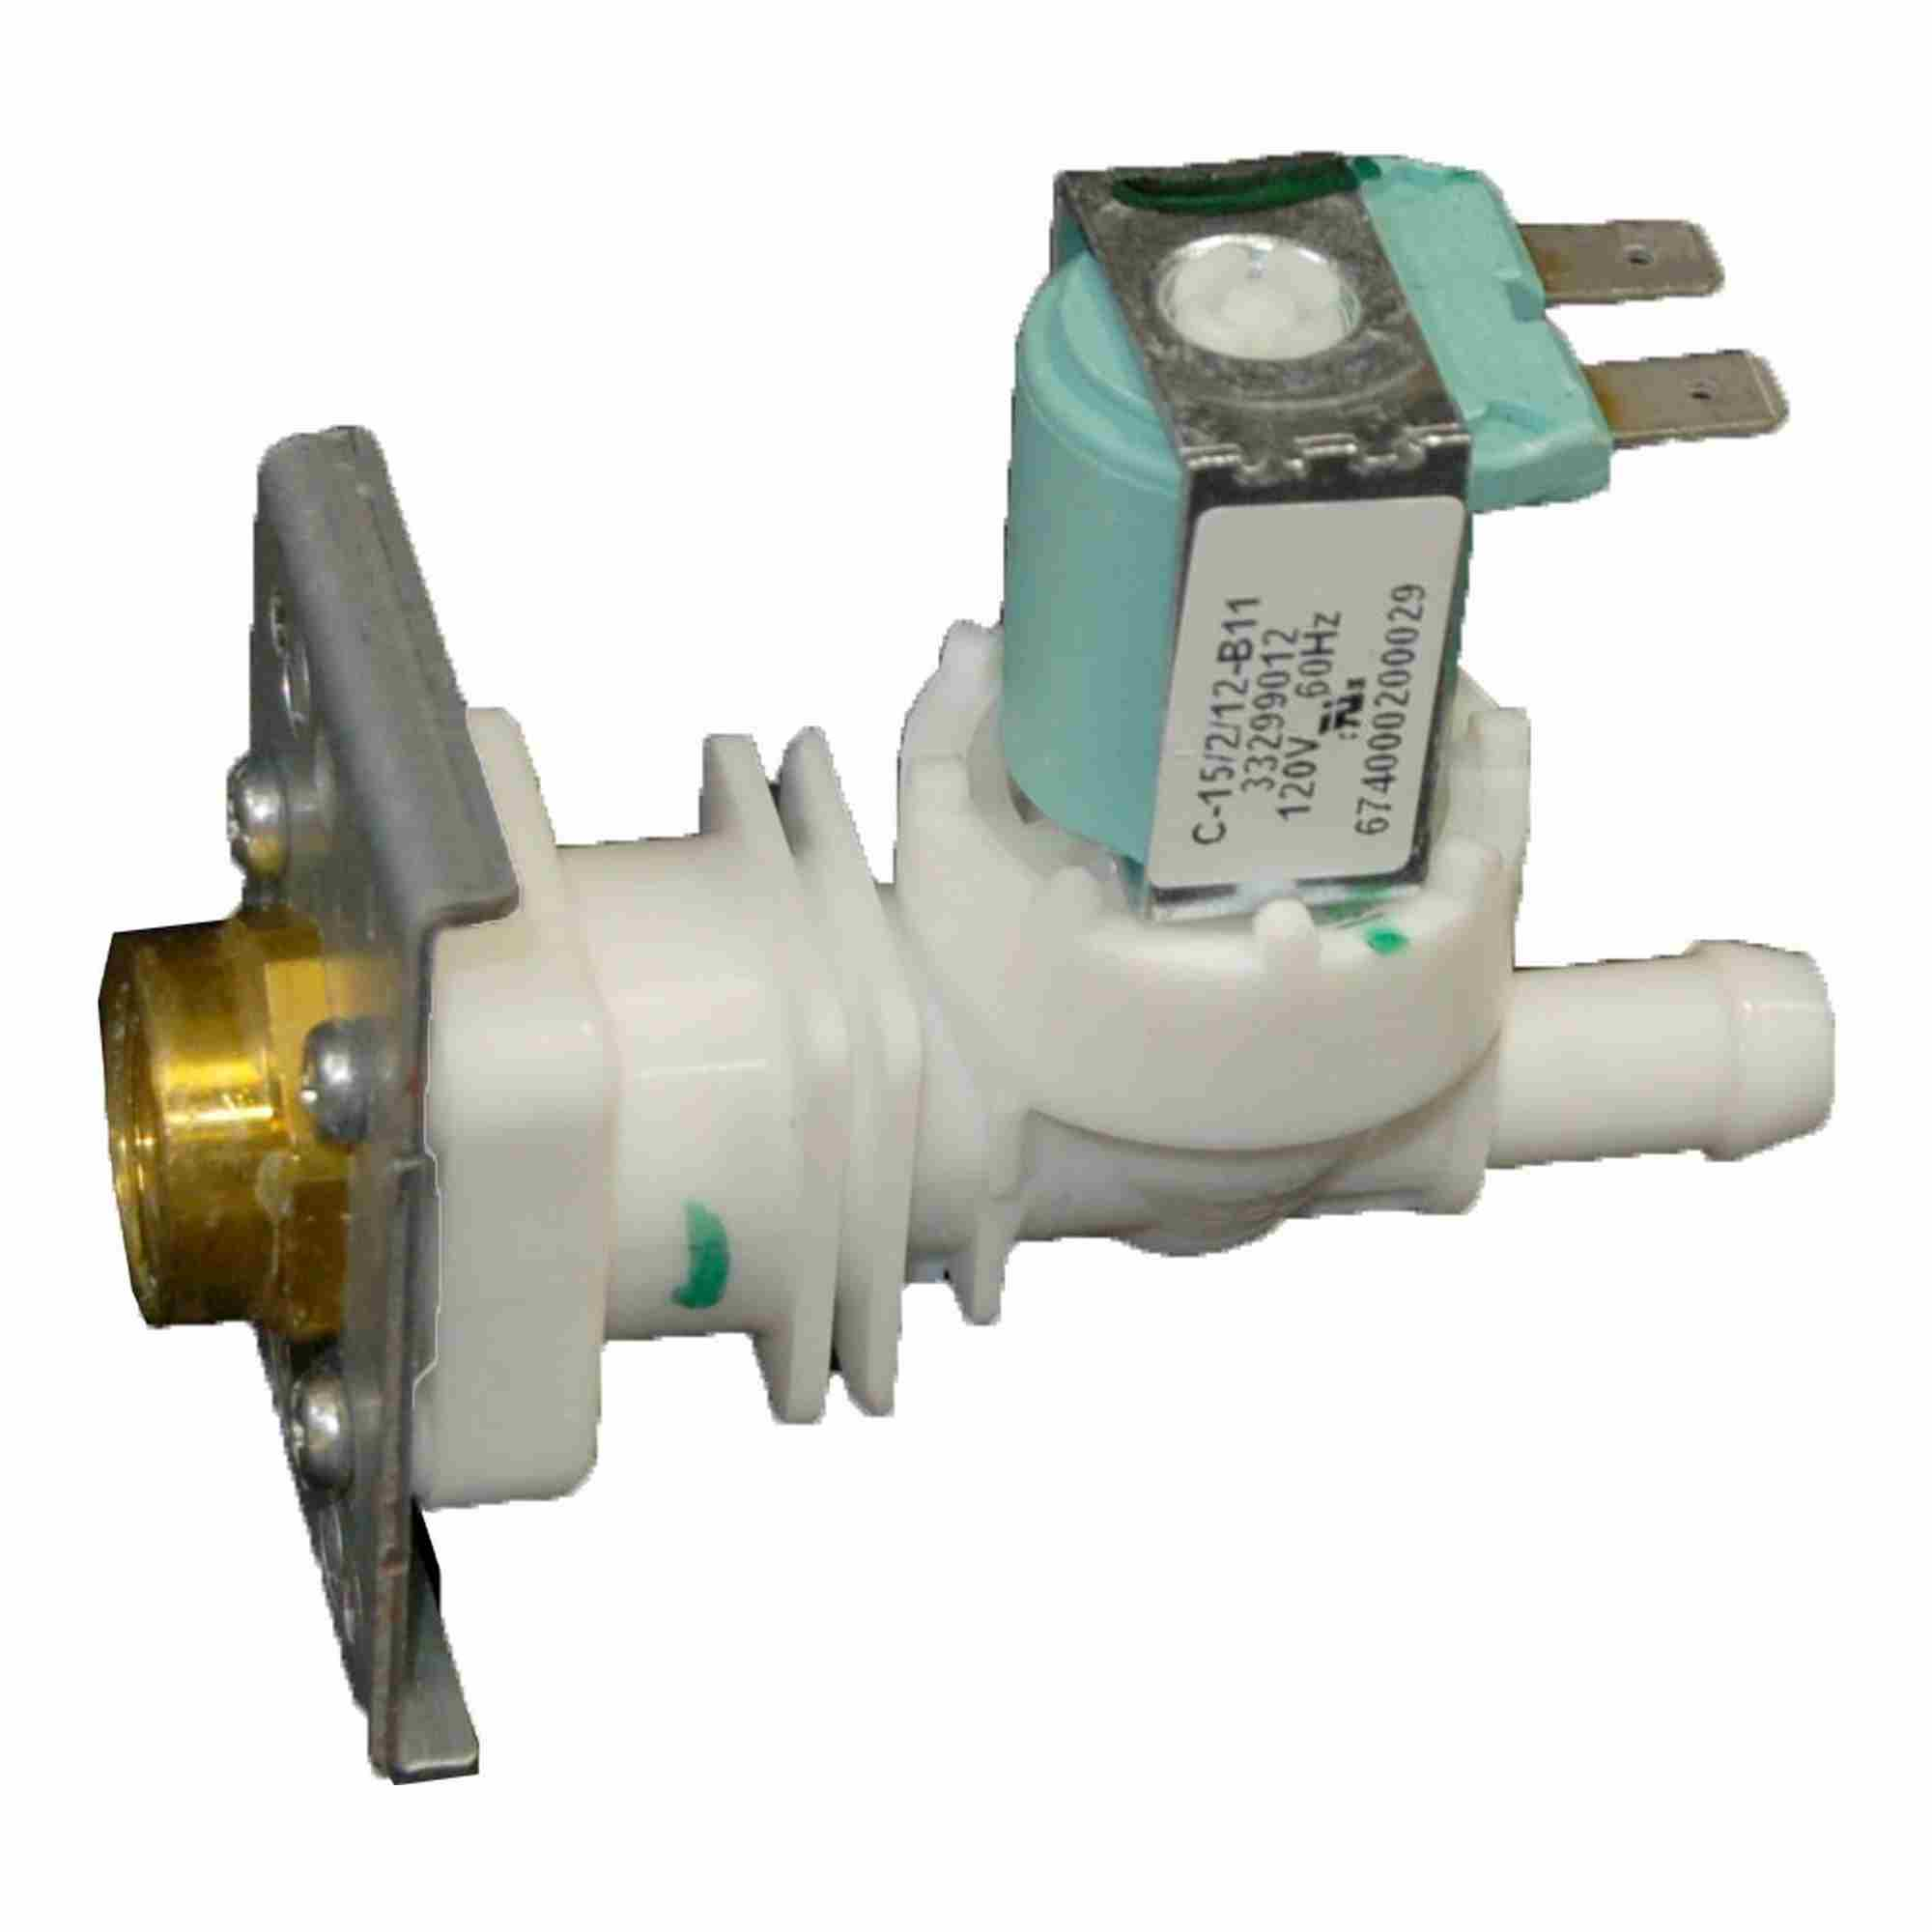 dd62 00084a genuine oem samsung valve water dmt800 pp 12